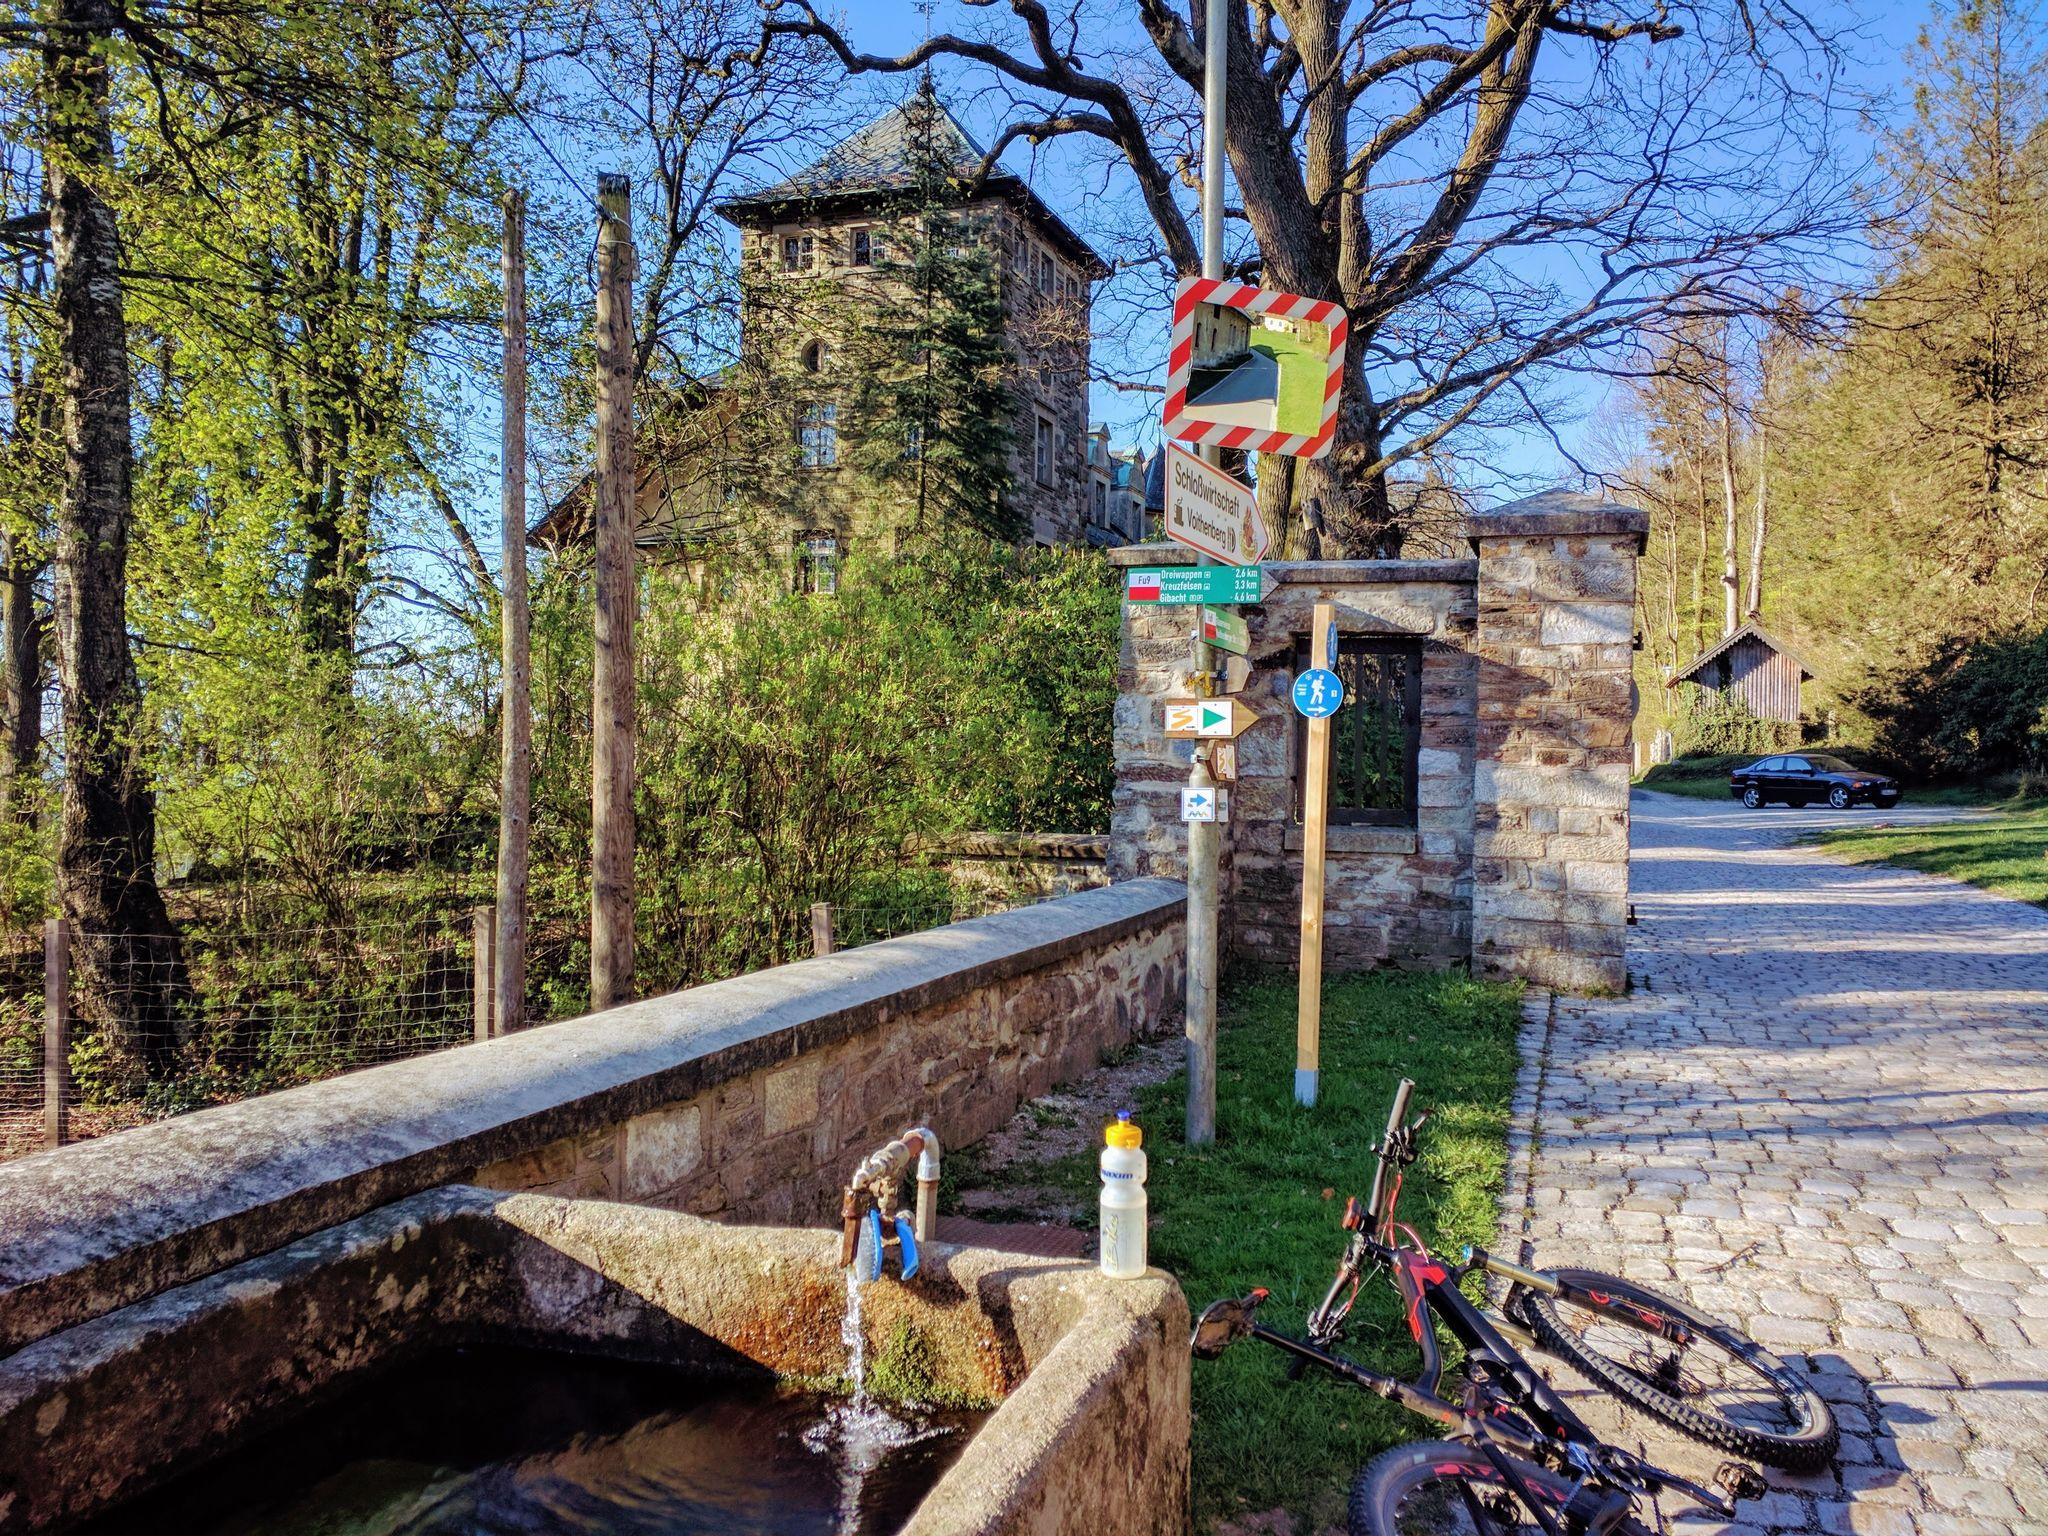 Trans Bayerwald - Wasserflaschen auffüllen am Schloss Voithenberg